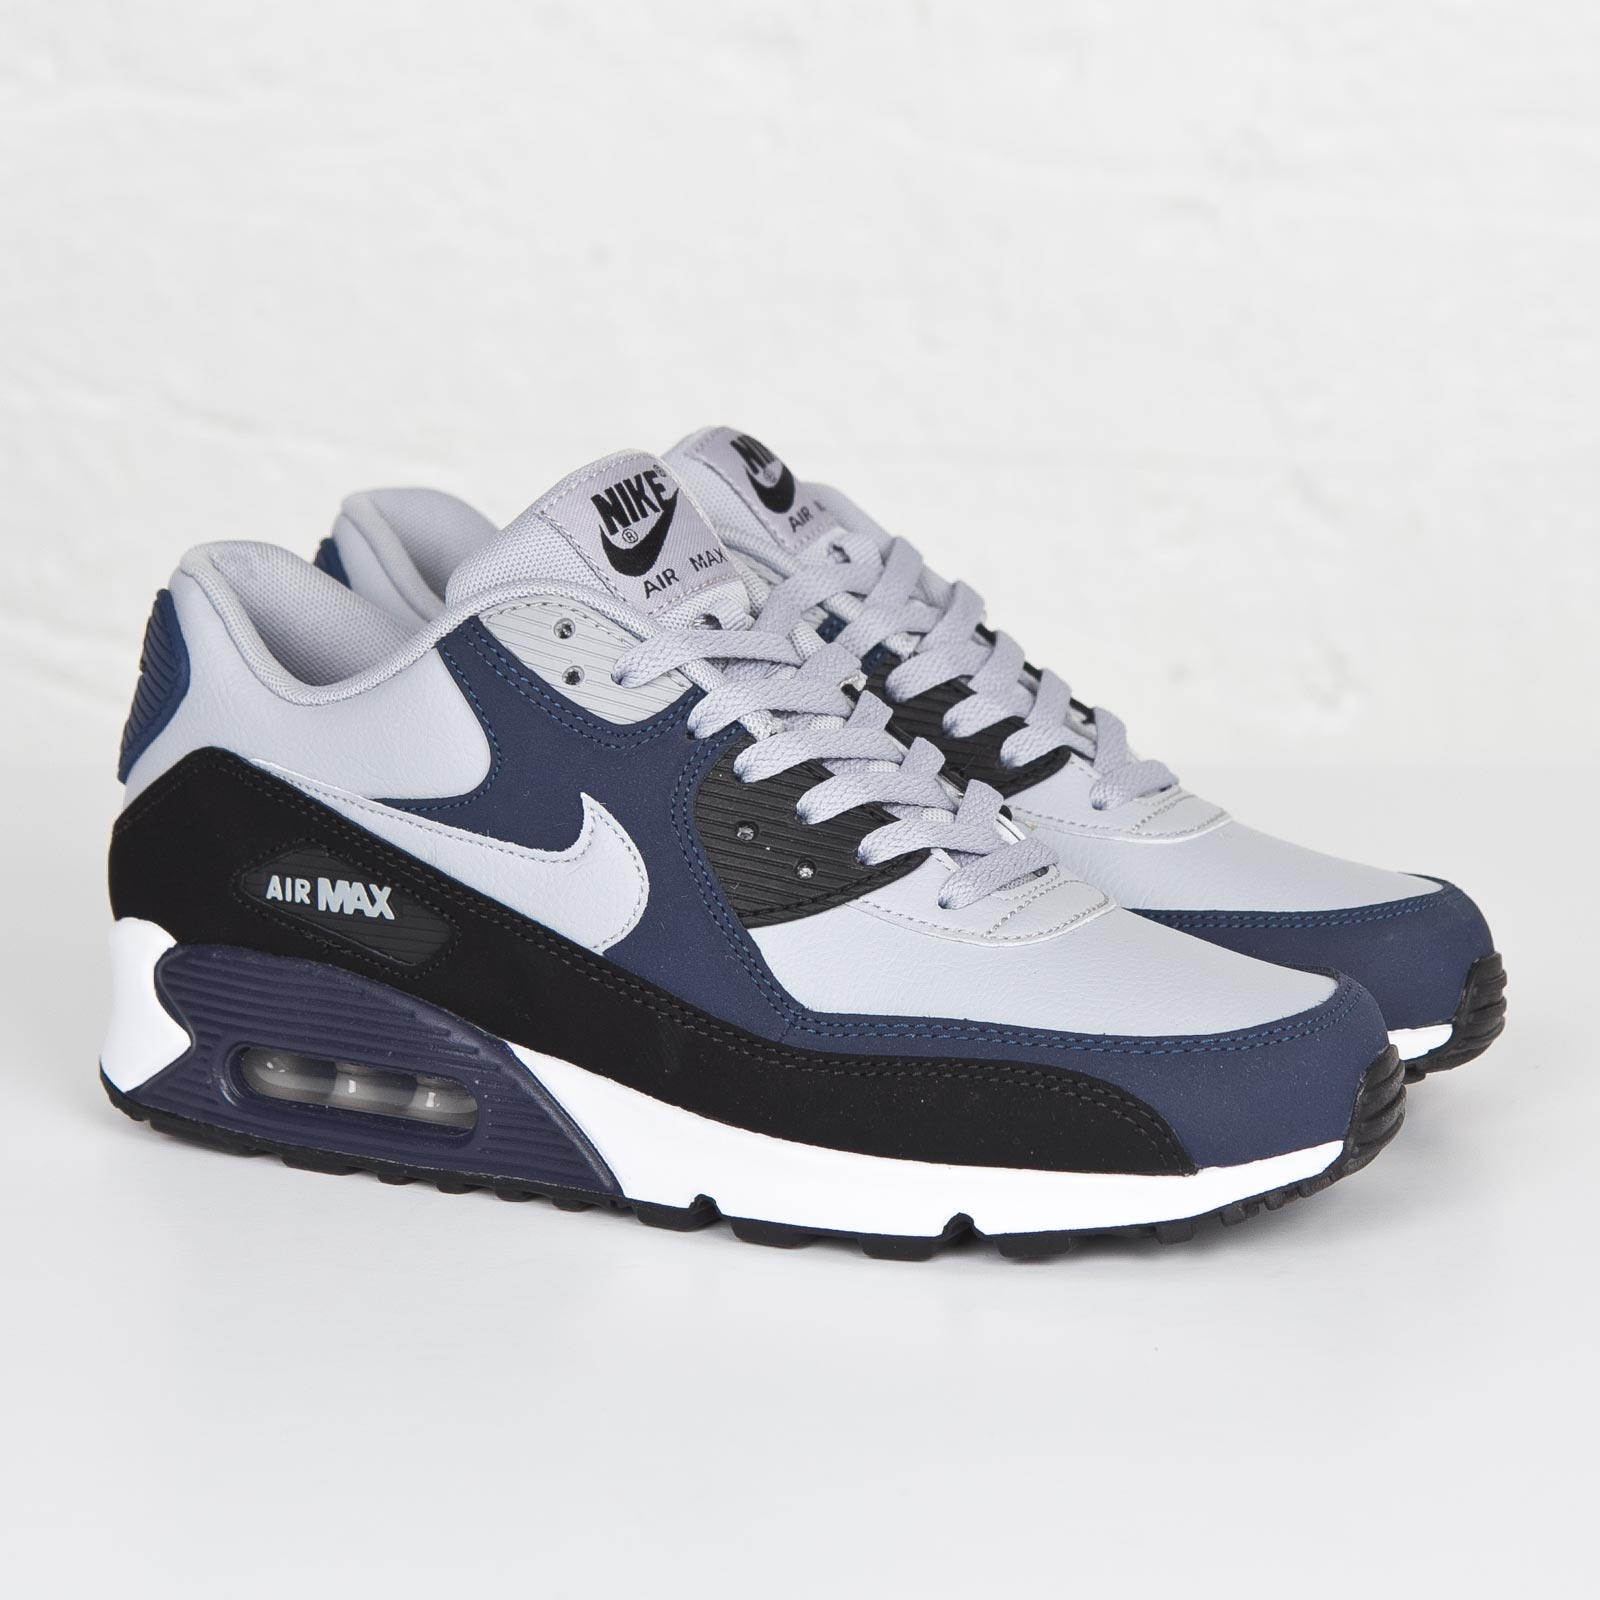 pretty nice 0522e 4cb01 Nike Air Max 90 LTR - 652980-011 - Sneakersnstuff | sneakers ...